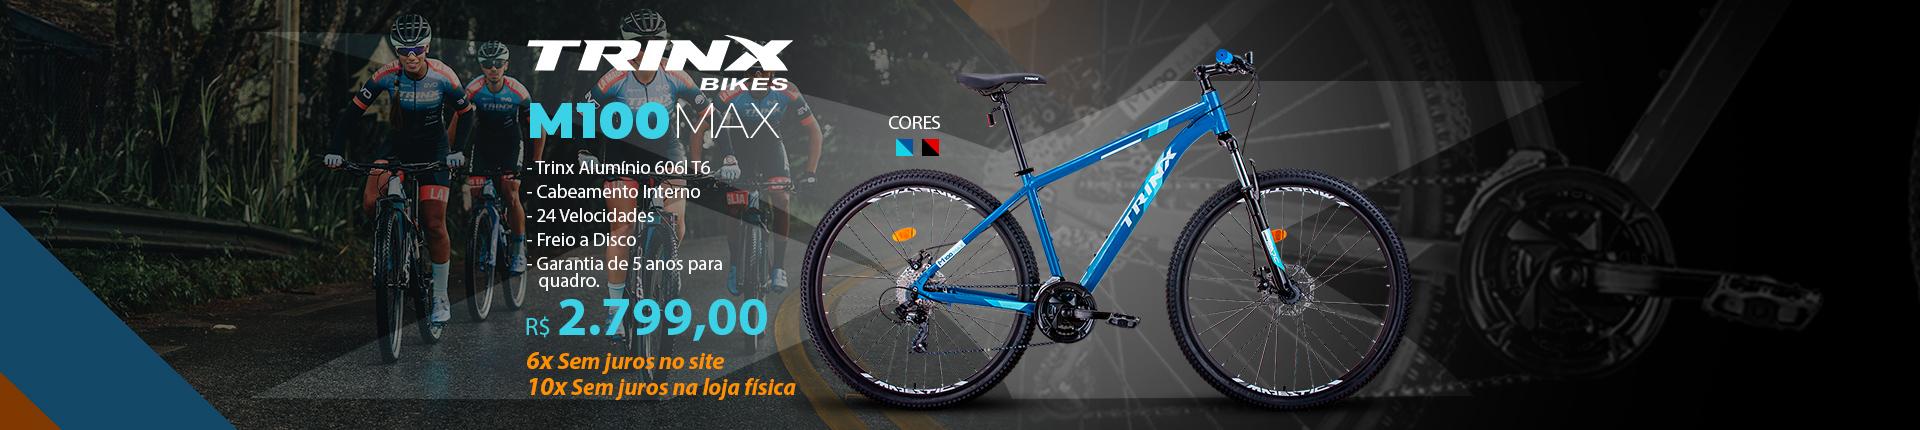 Bicicleta Trinx Alumínio Aro 29